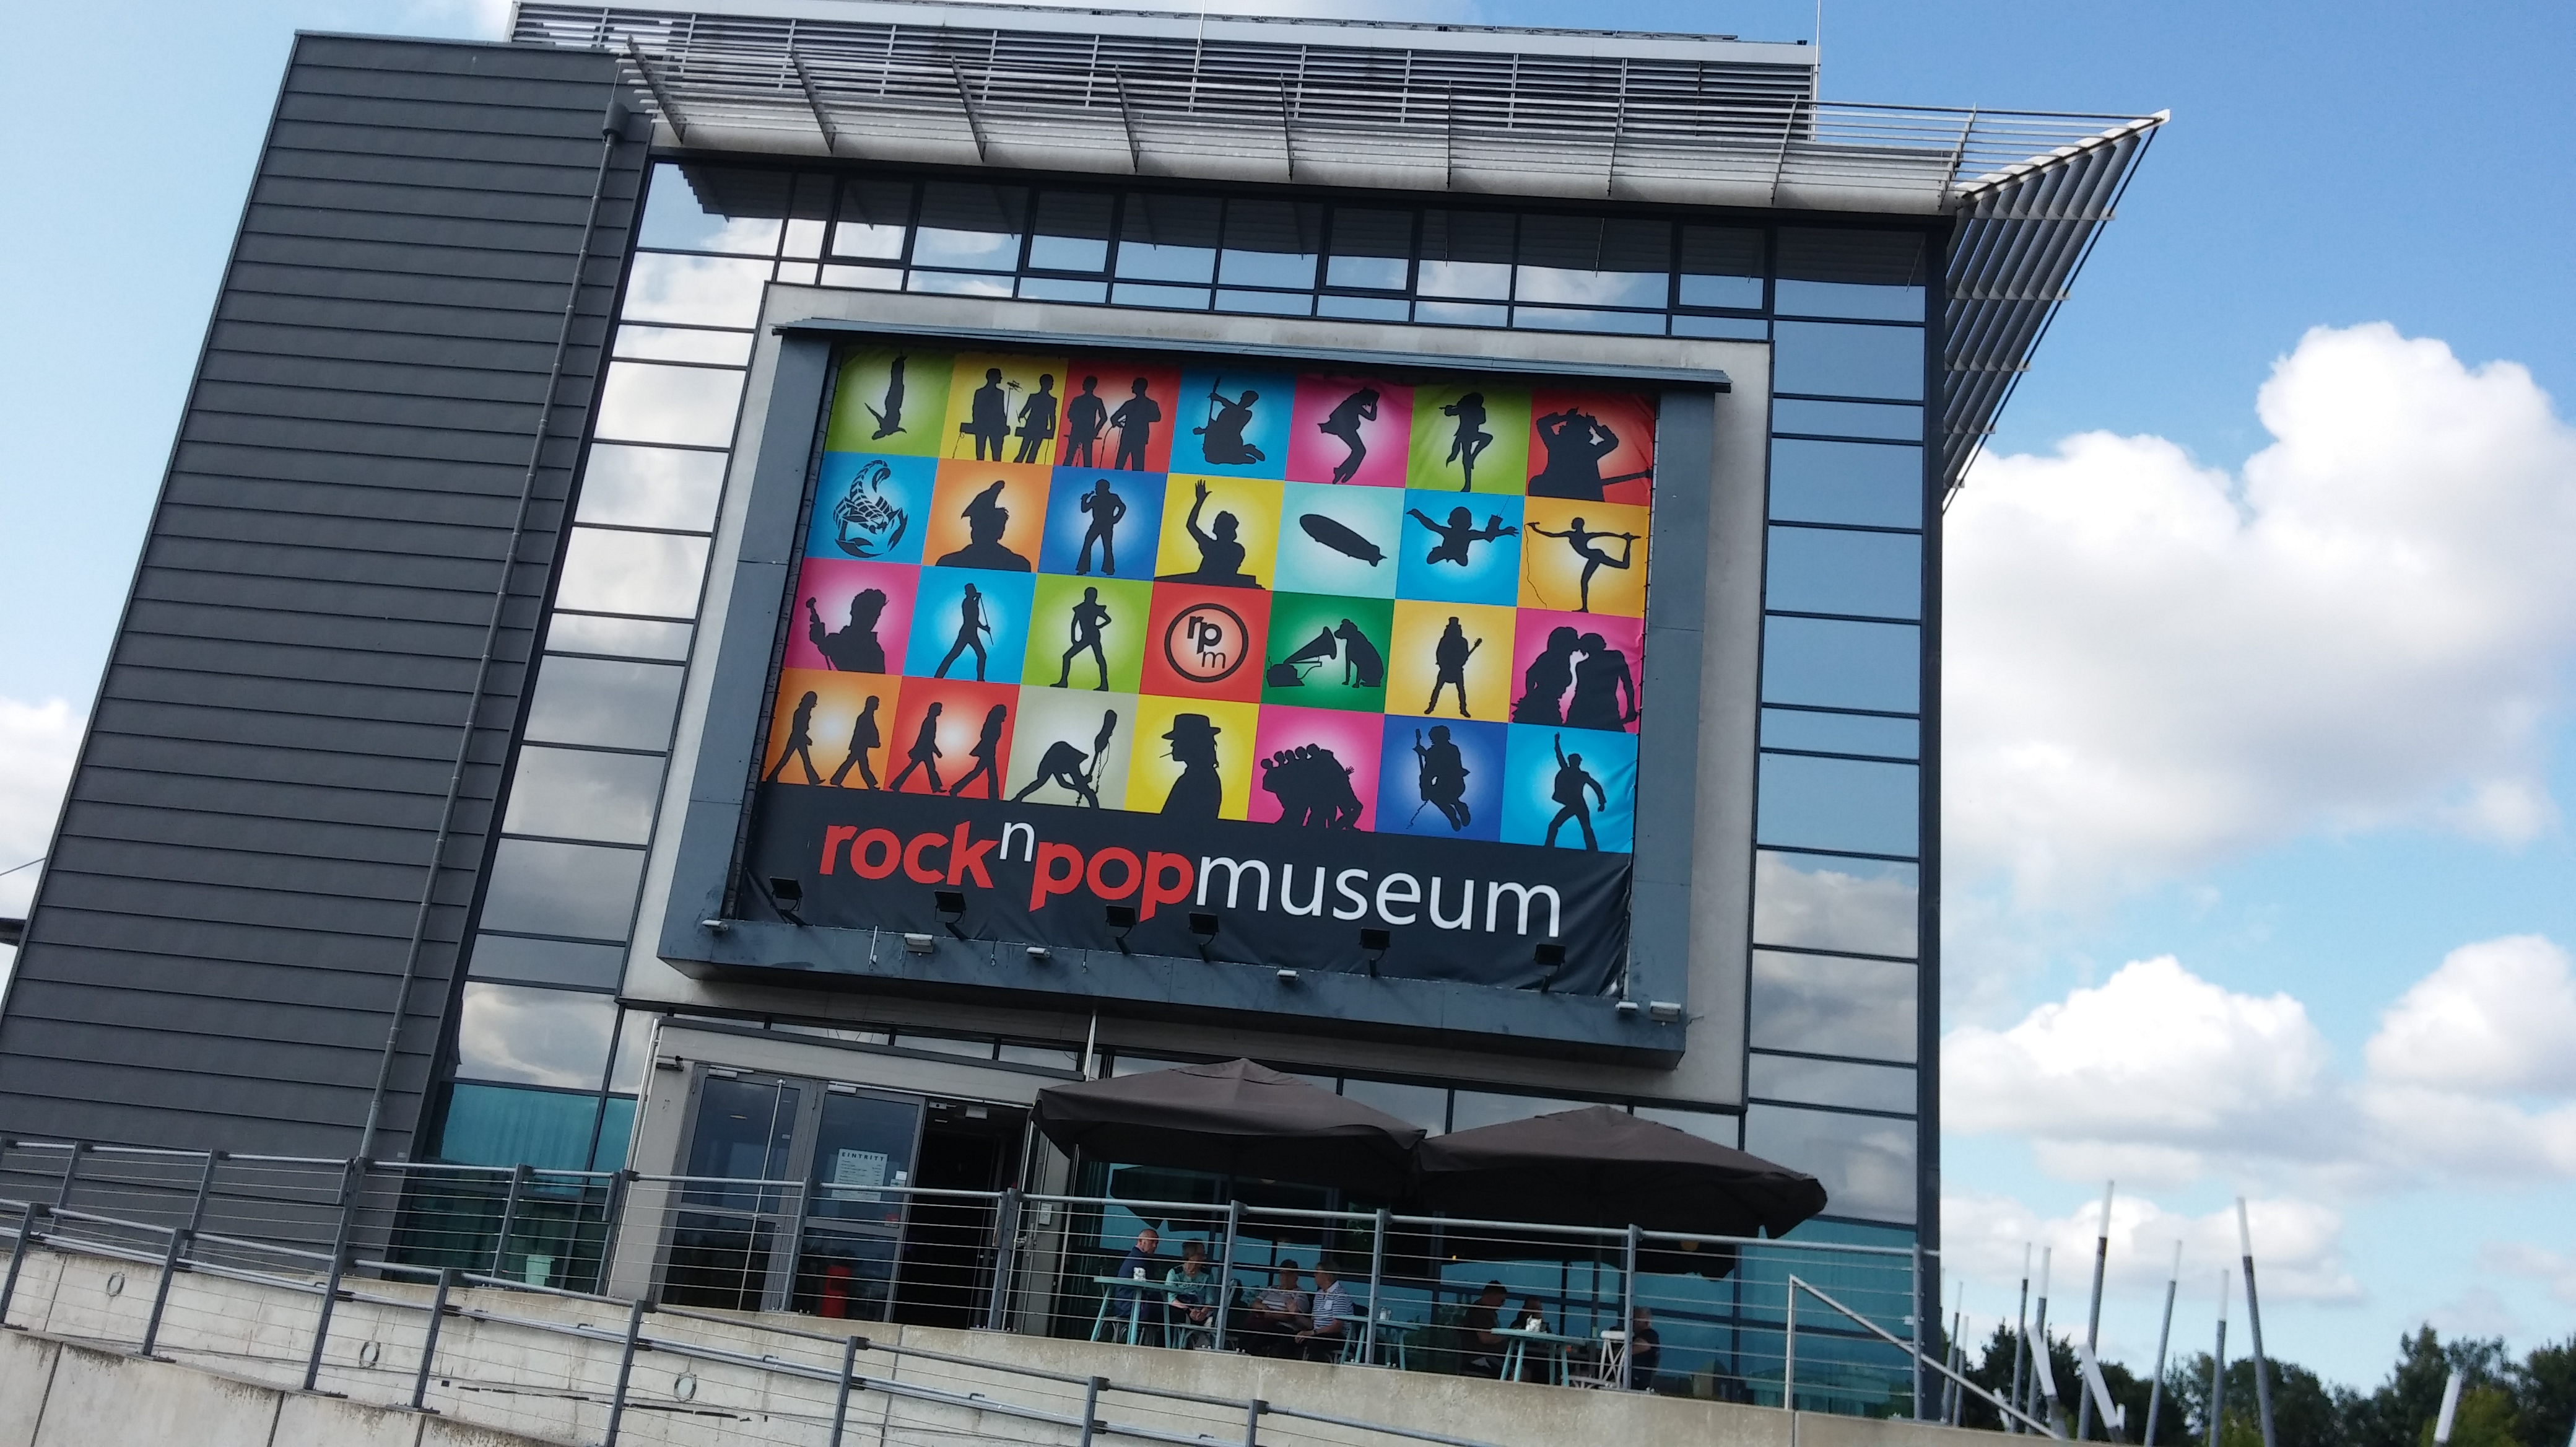 20190713_172810Rockmuseum